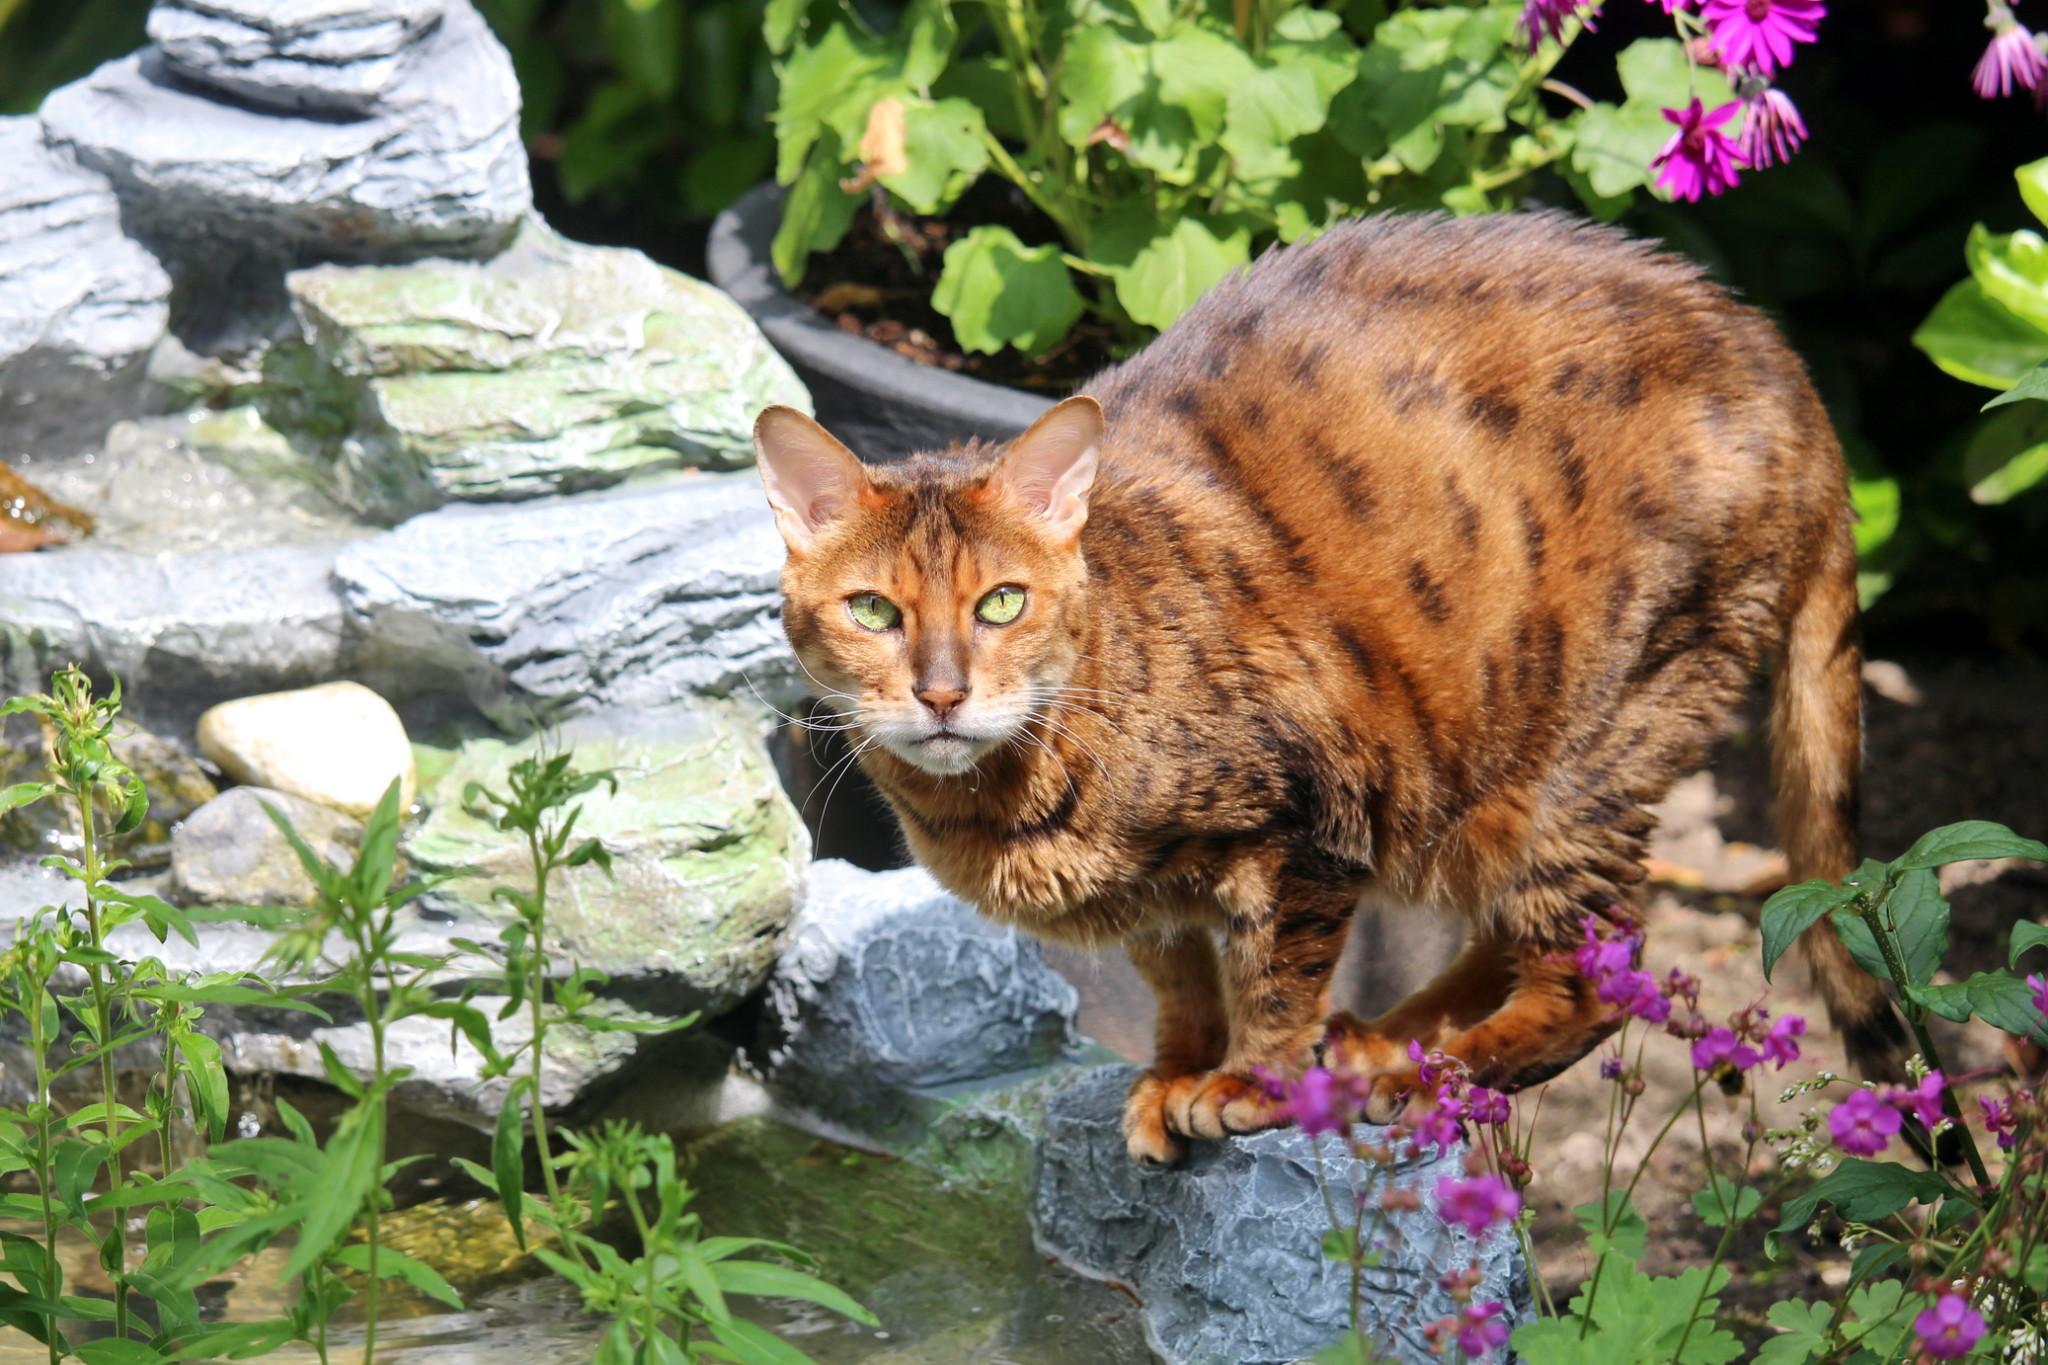 Katzenpsychologie-Wedel: Tierfotografie